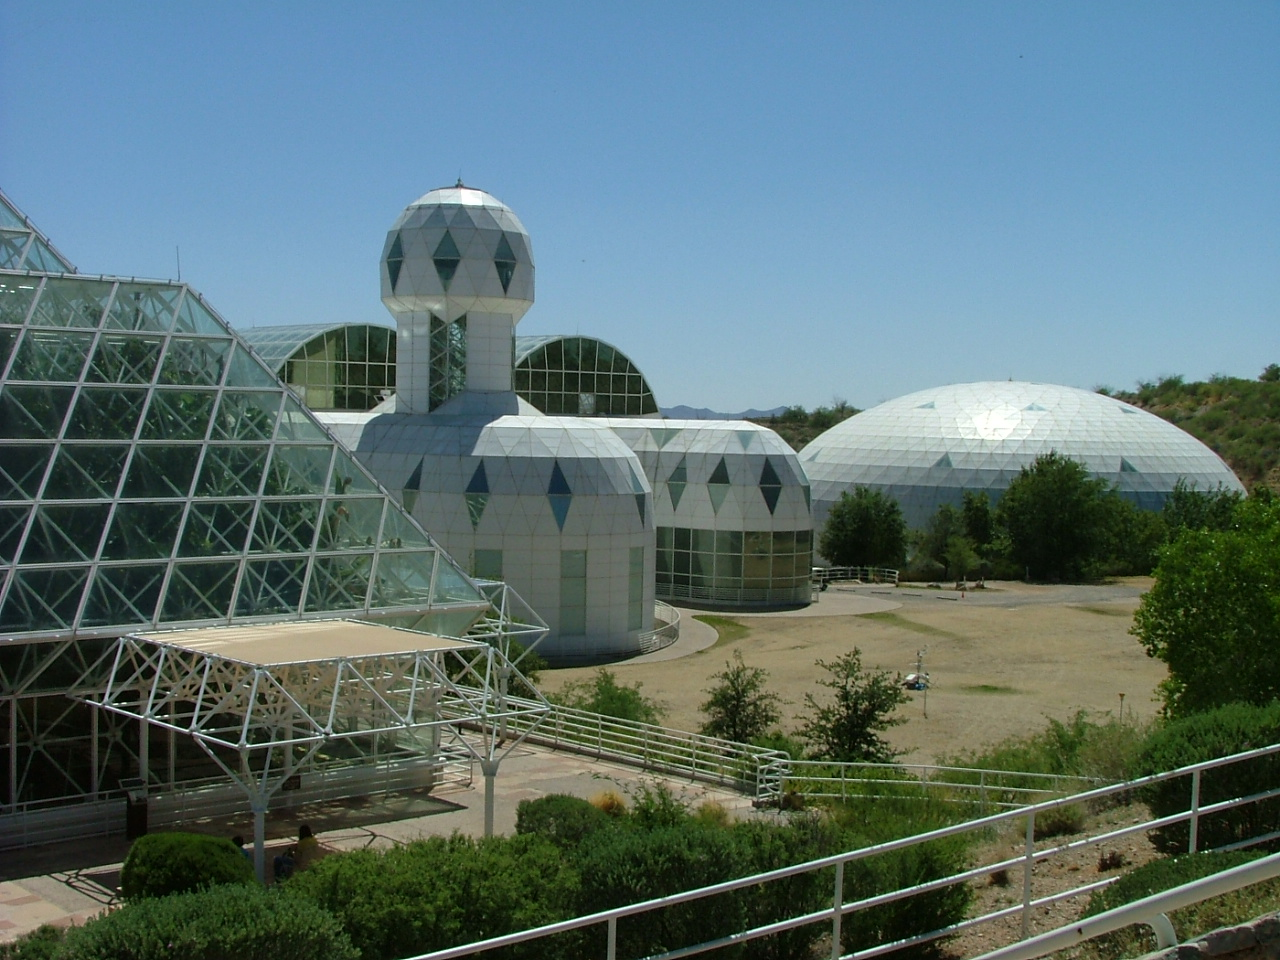 Biosphere_2_Habitat_&_Lung_2009-05-10.jpg